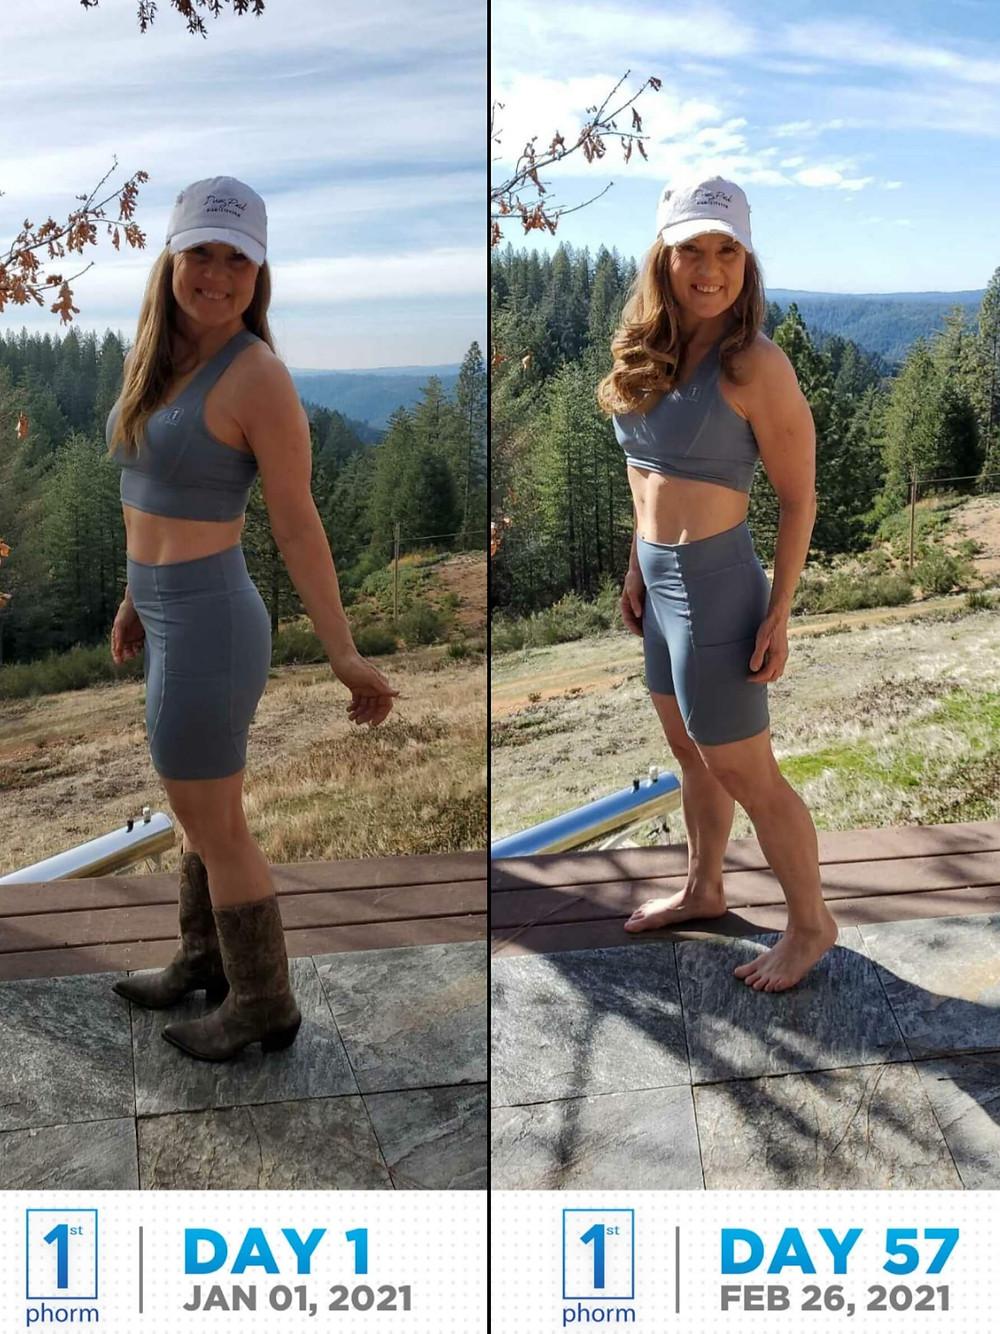 sid body progress